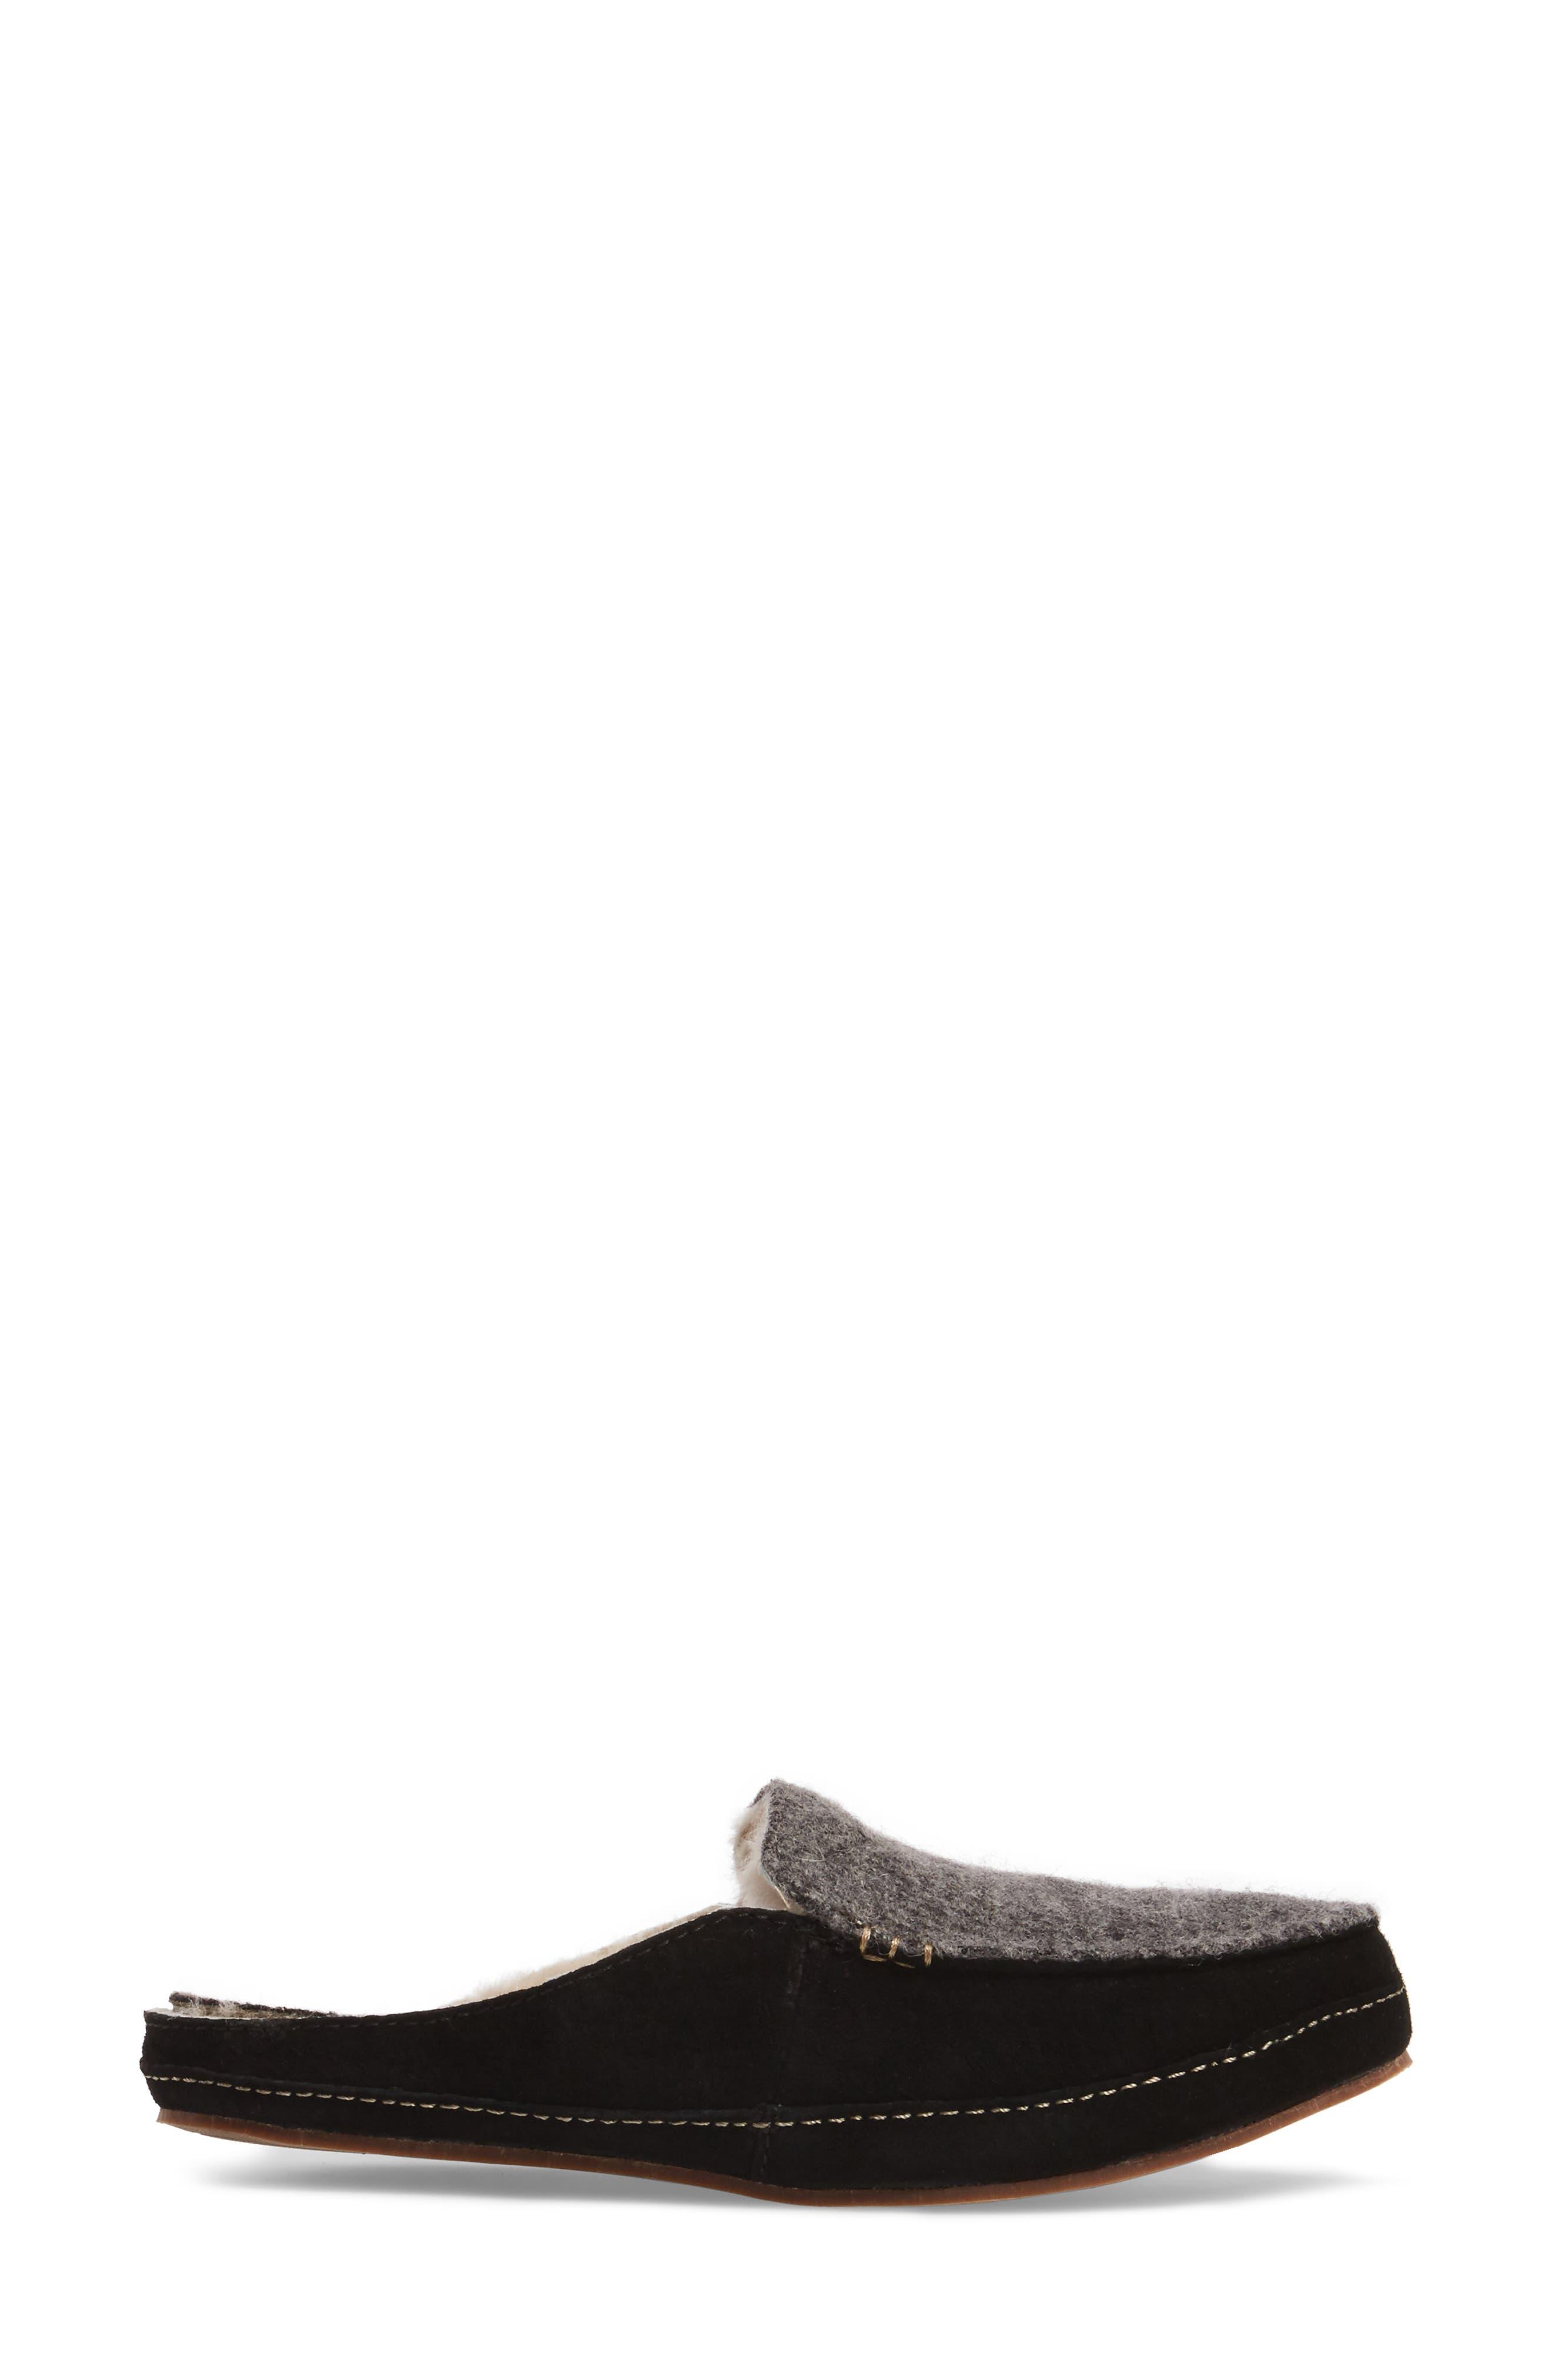 Alaula Genuine Shearling Lined Slipper,                             Alternate thumbnail 3, color,                             087